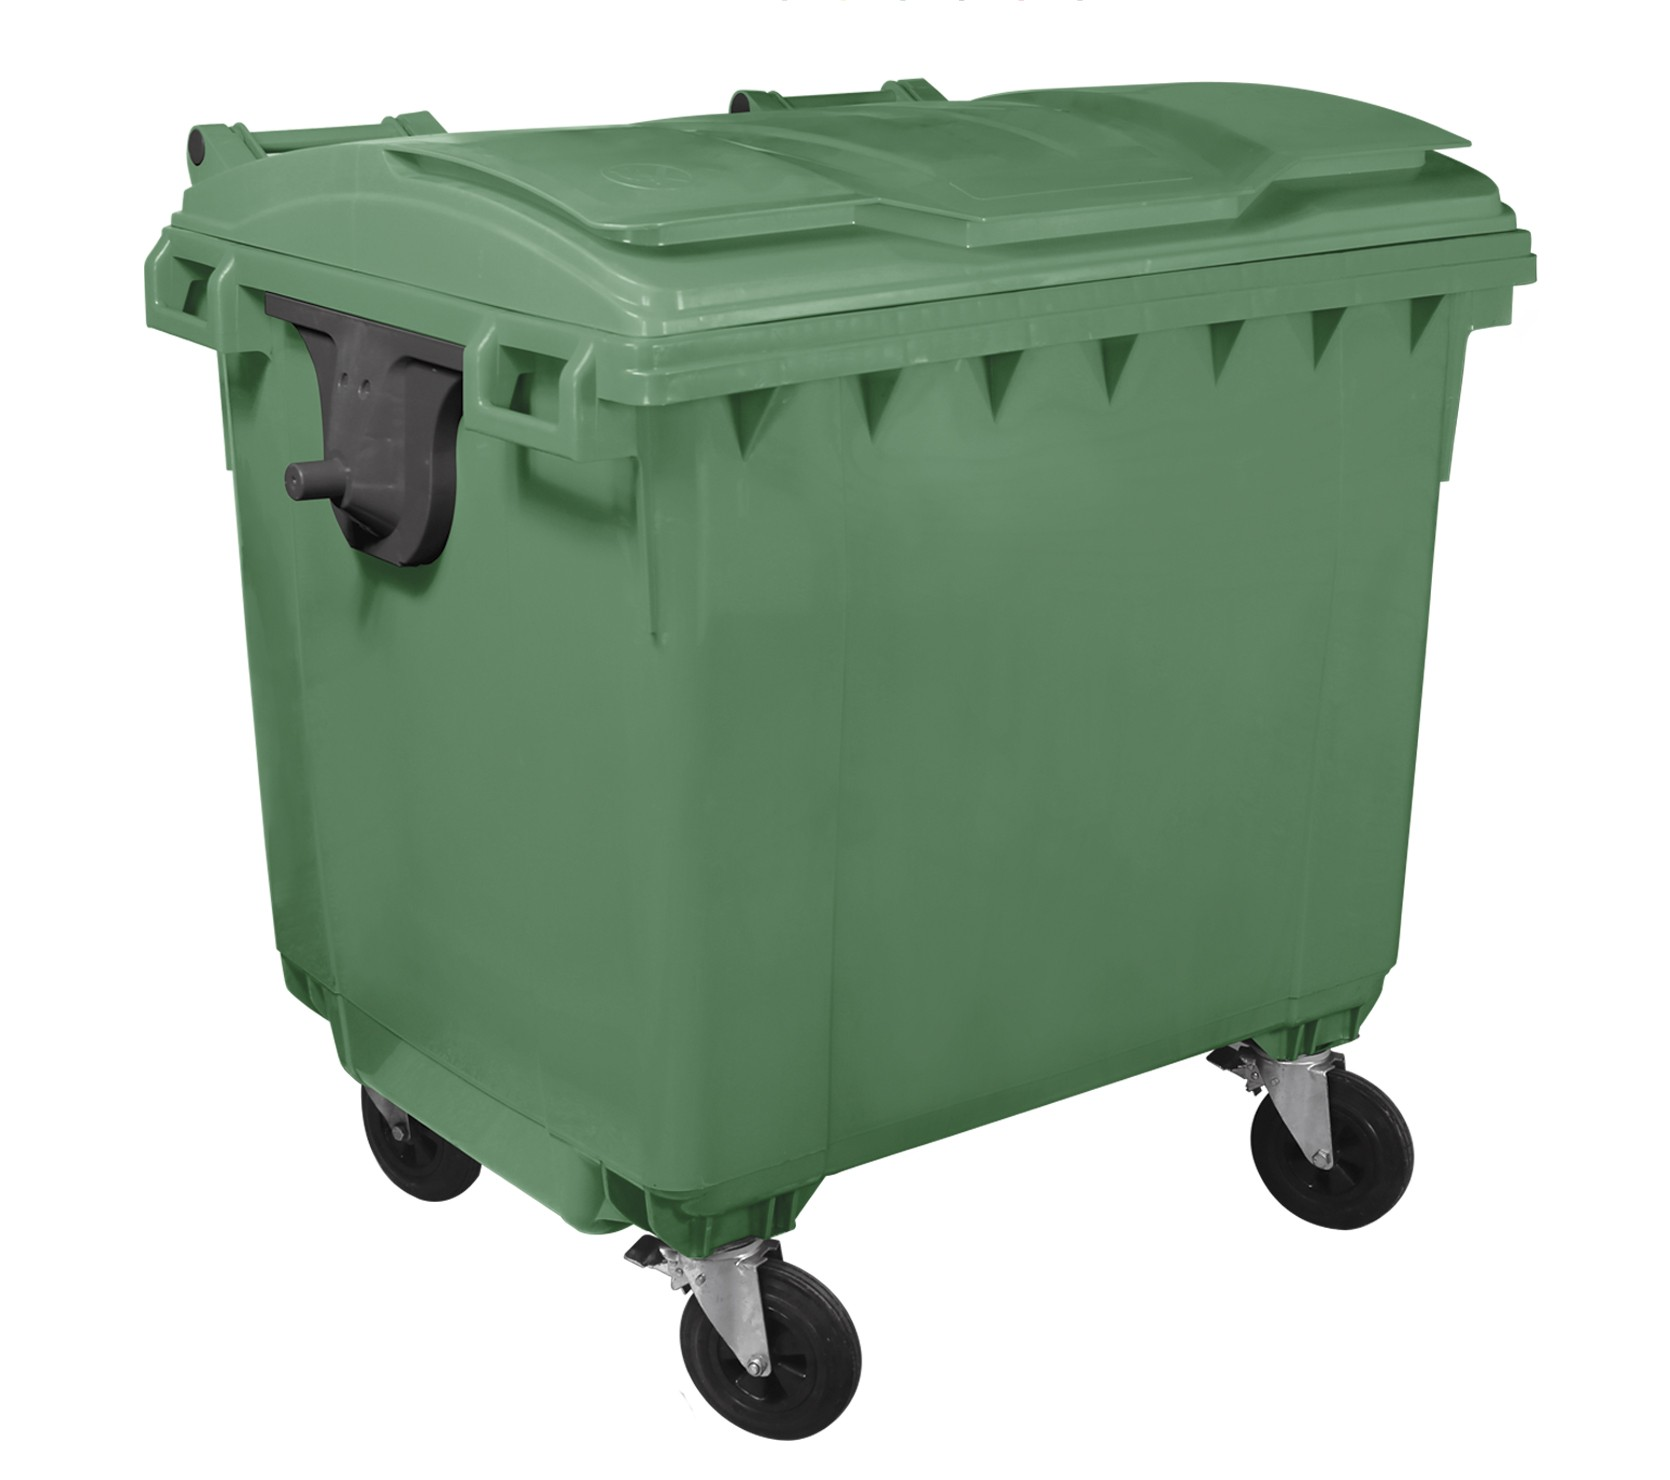 Container Hdpe Clf 1100l Cu Capac Plat Verde sanito.ro